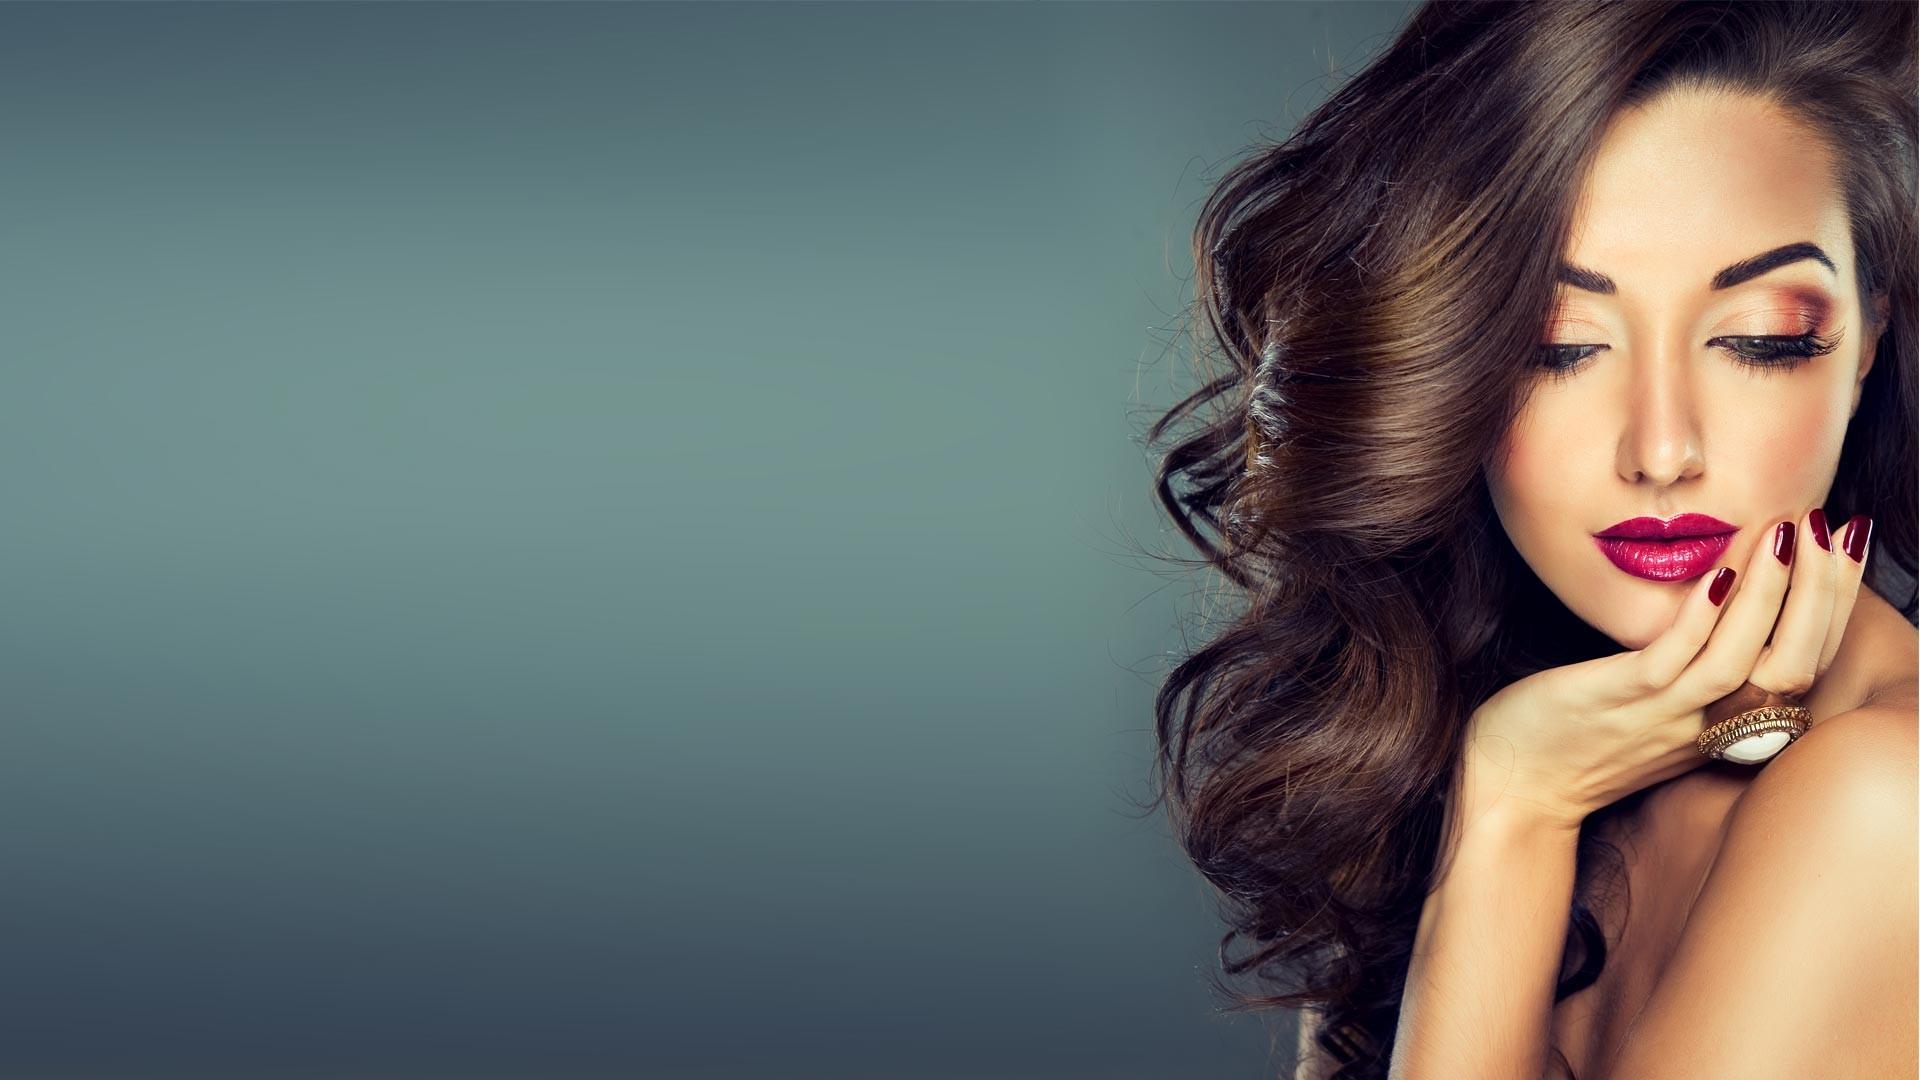 Custom 3D Beauty Salons Wallpaper Europe and the United ...  |Beauty Salon Wallpaper Designs